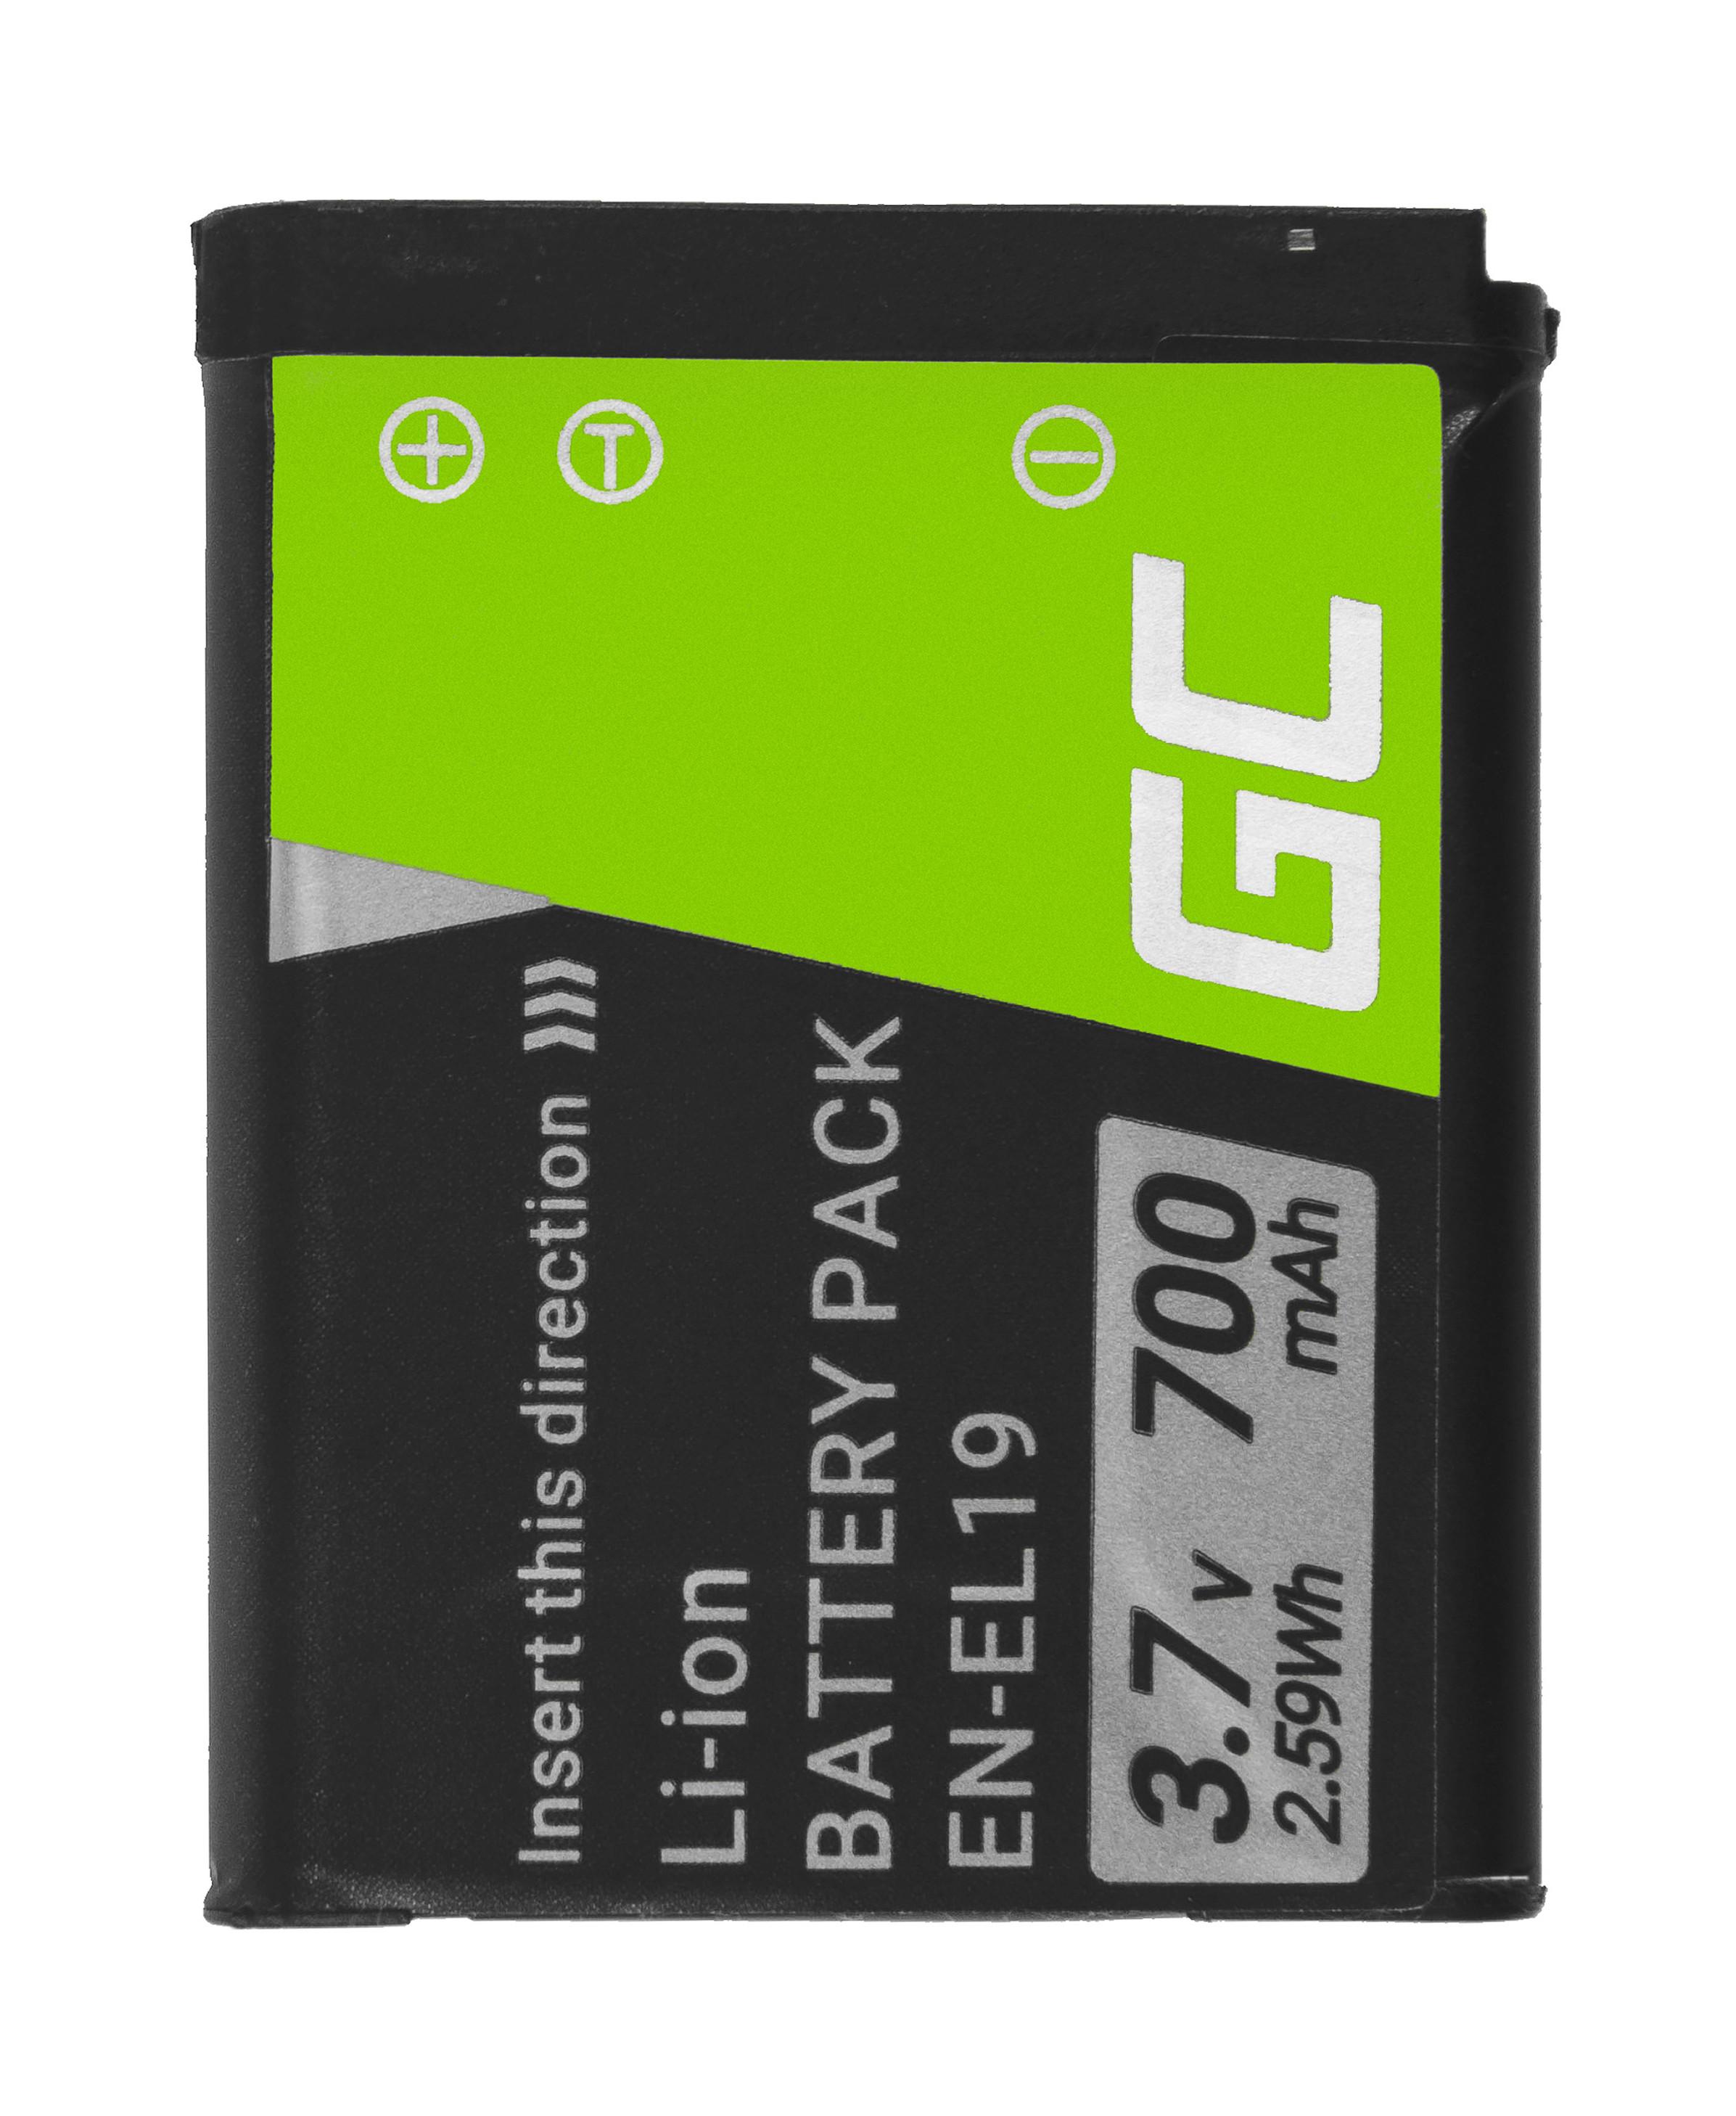 Baterie Green Cell Nikon Coolpix EN-EL19 670mAh Li-ion - neoriginální